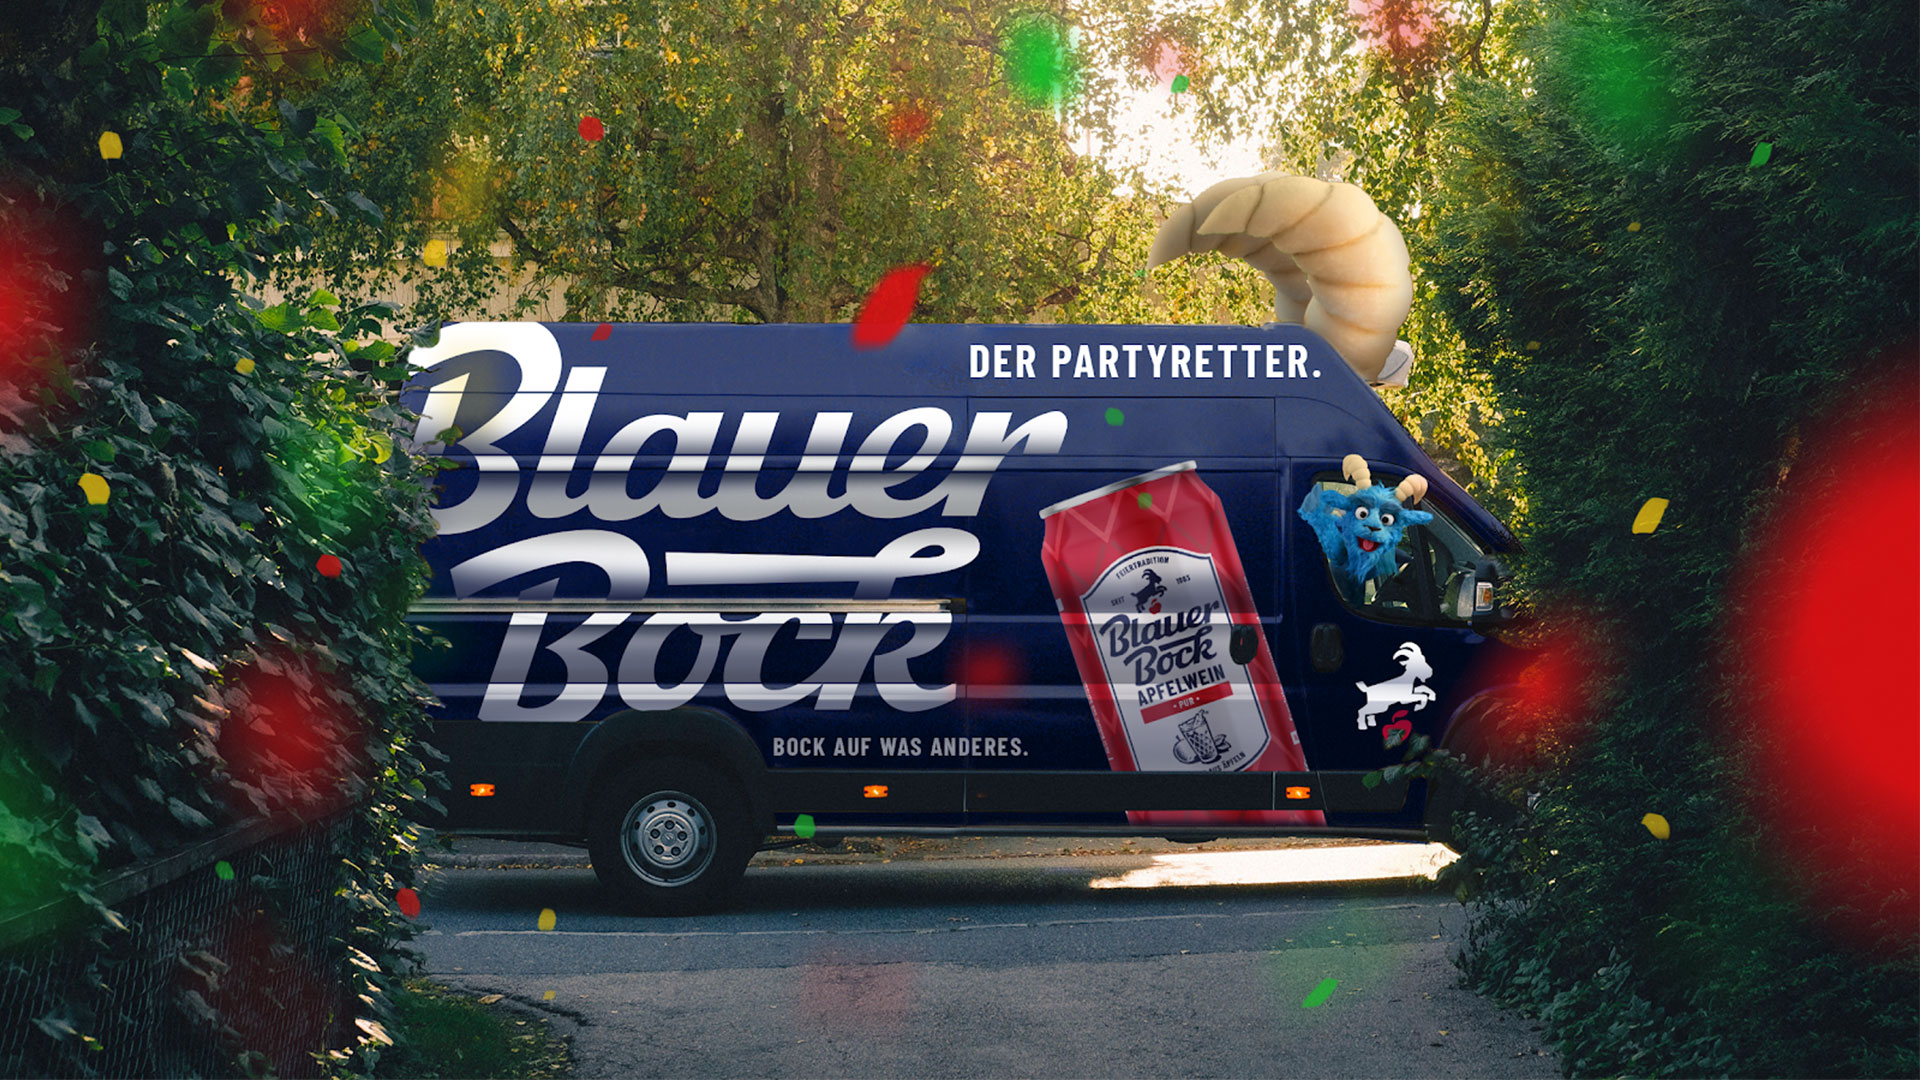 Lieferbock_Transporter_1920x1080